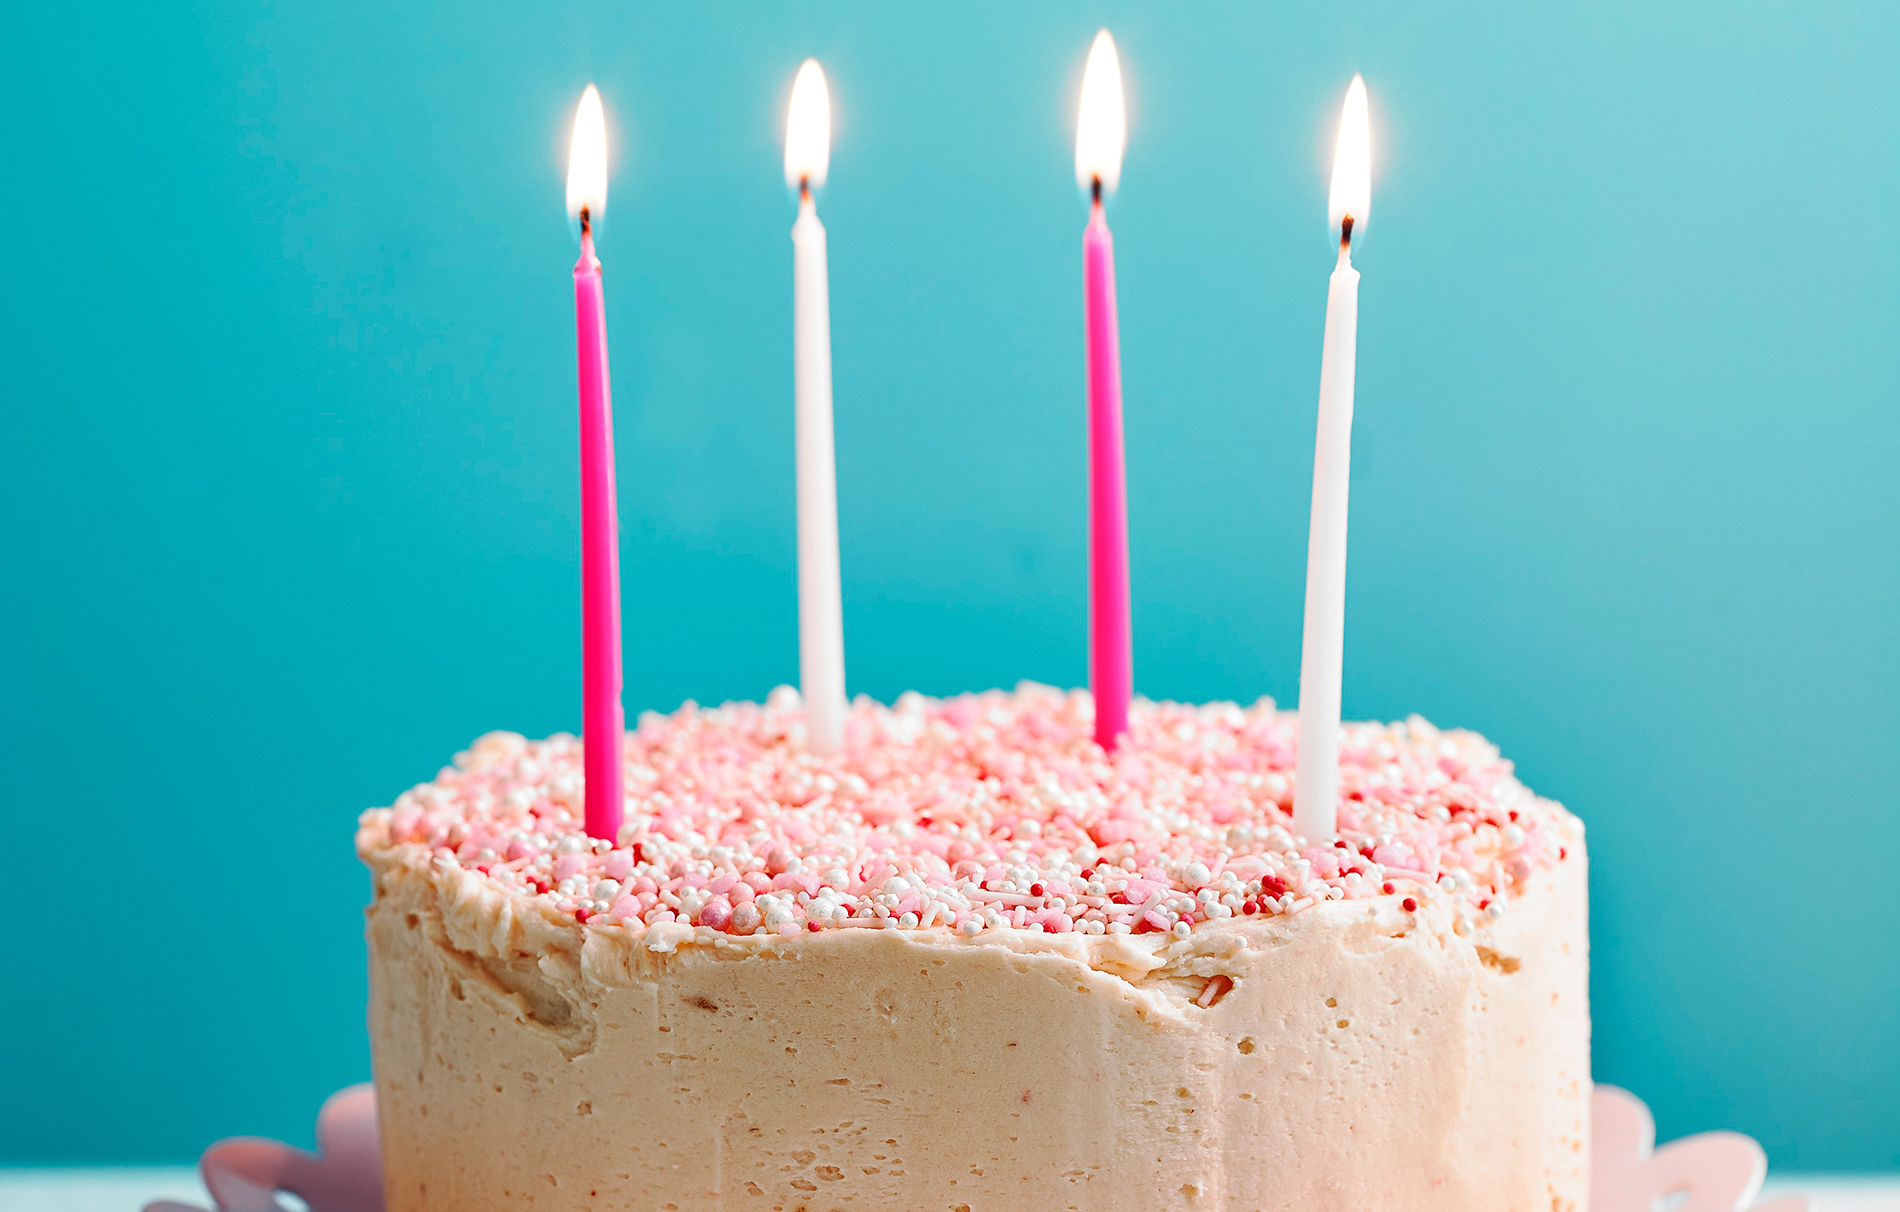 Astounding Nadiya Hussains Confetti Birthday Cake Baking Recipes Goodtoknow Funny Birthday Cards Online Elaedamsfinfo